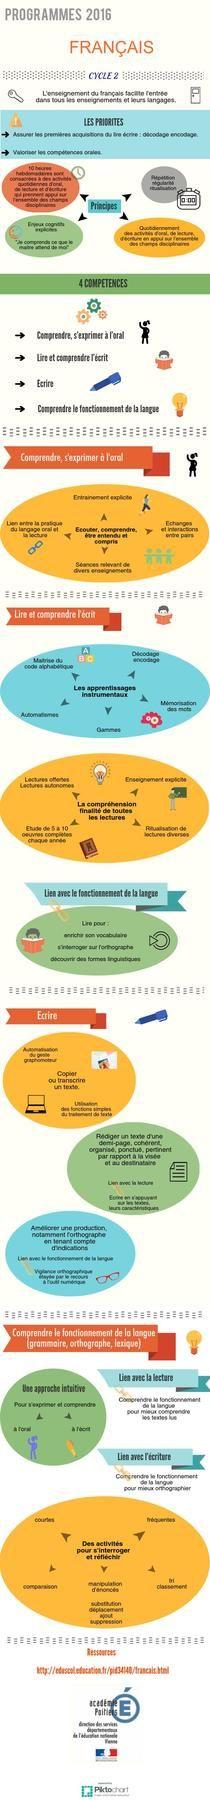 Français Cycle 2  | Piktochart Infographic Editor